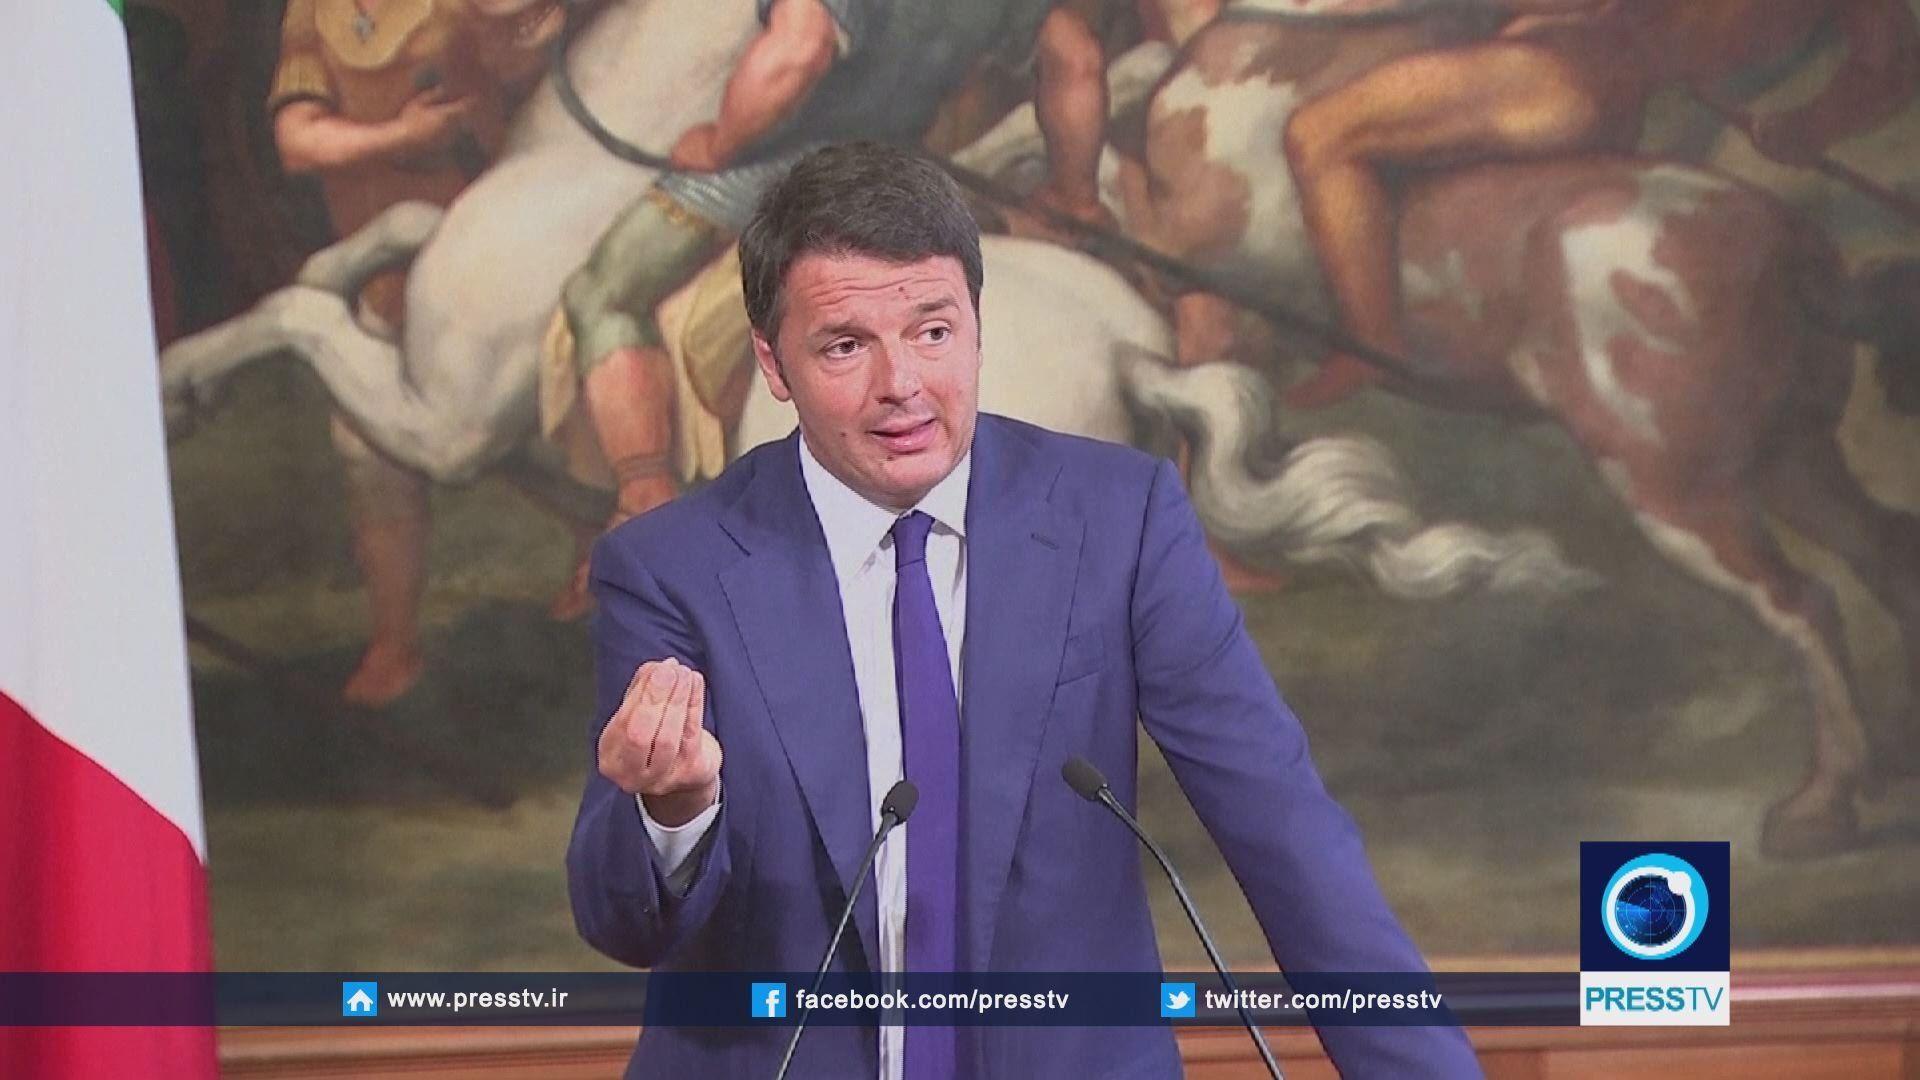 Italian PM compares EU to sinking ship